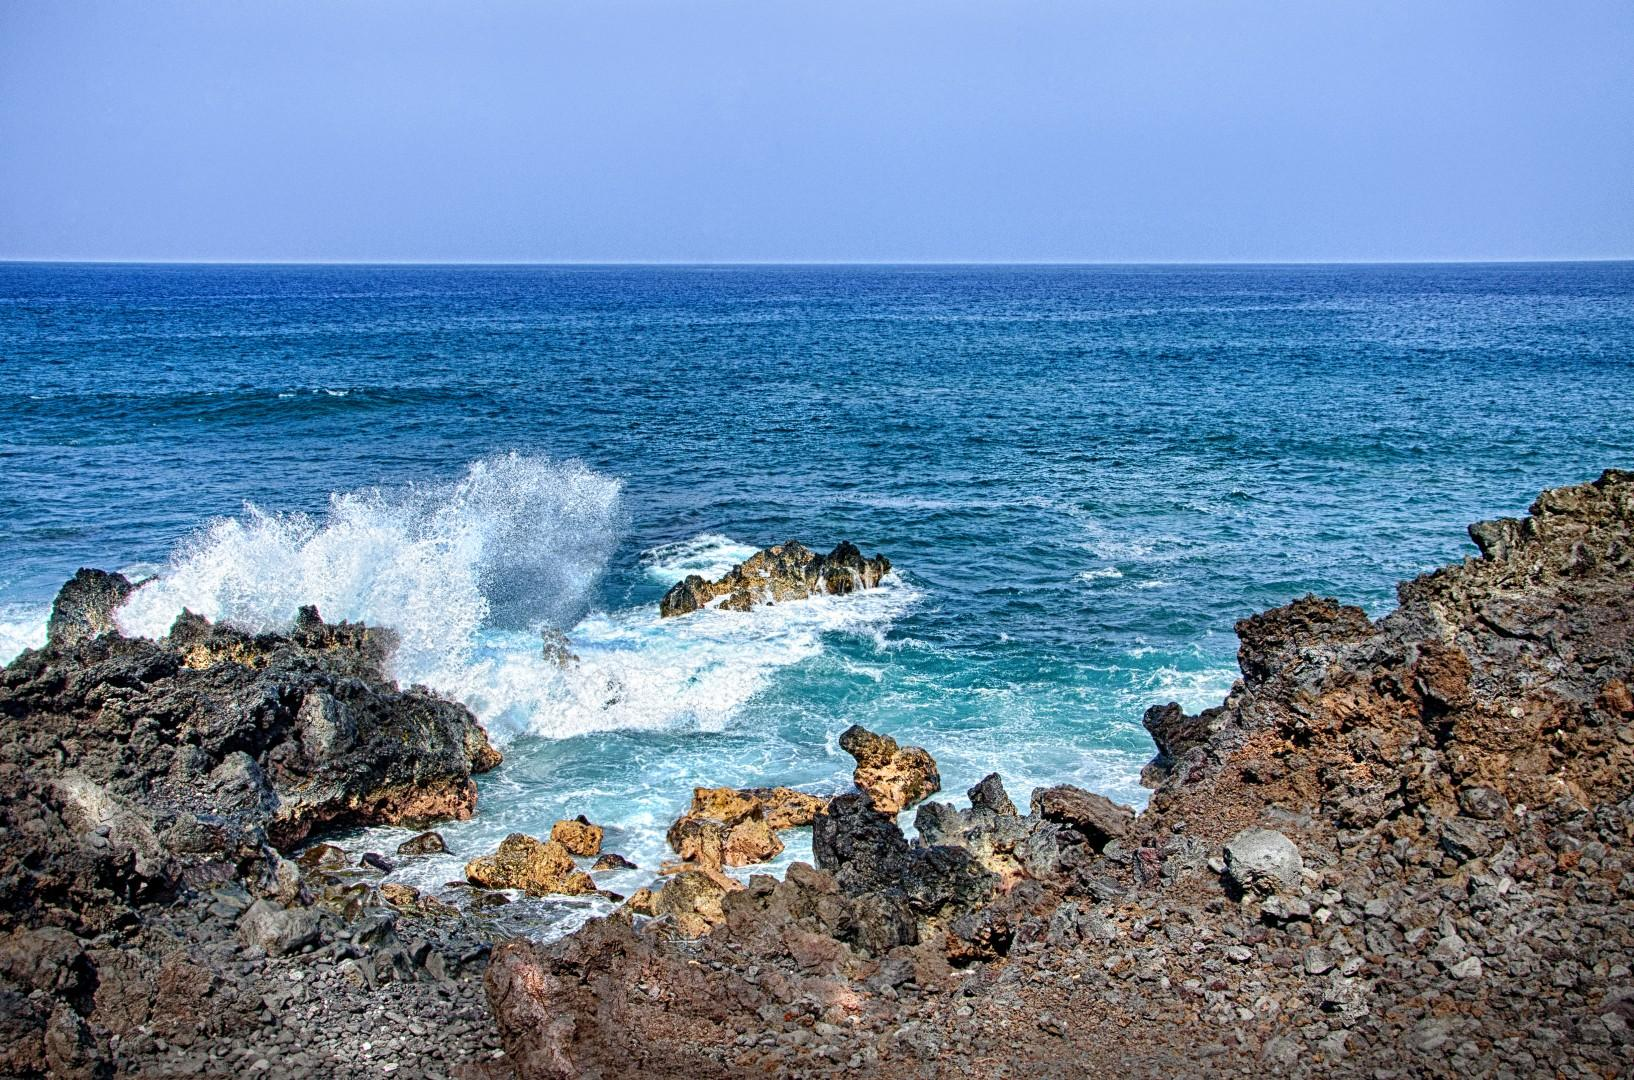 Oceans edge at Kanaloa